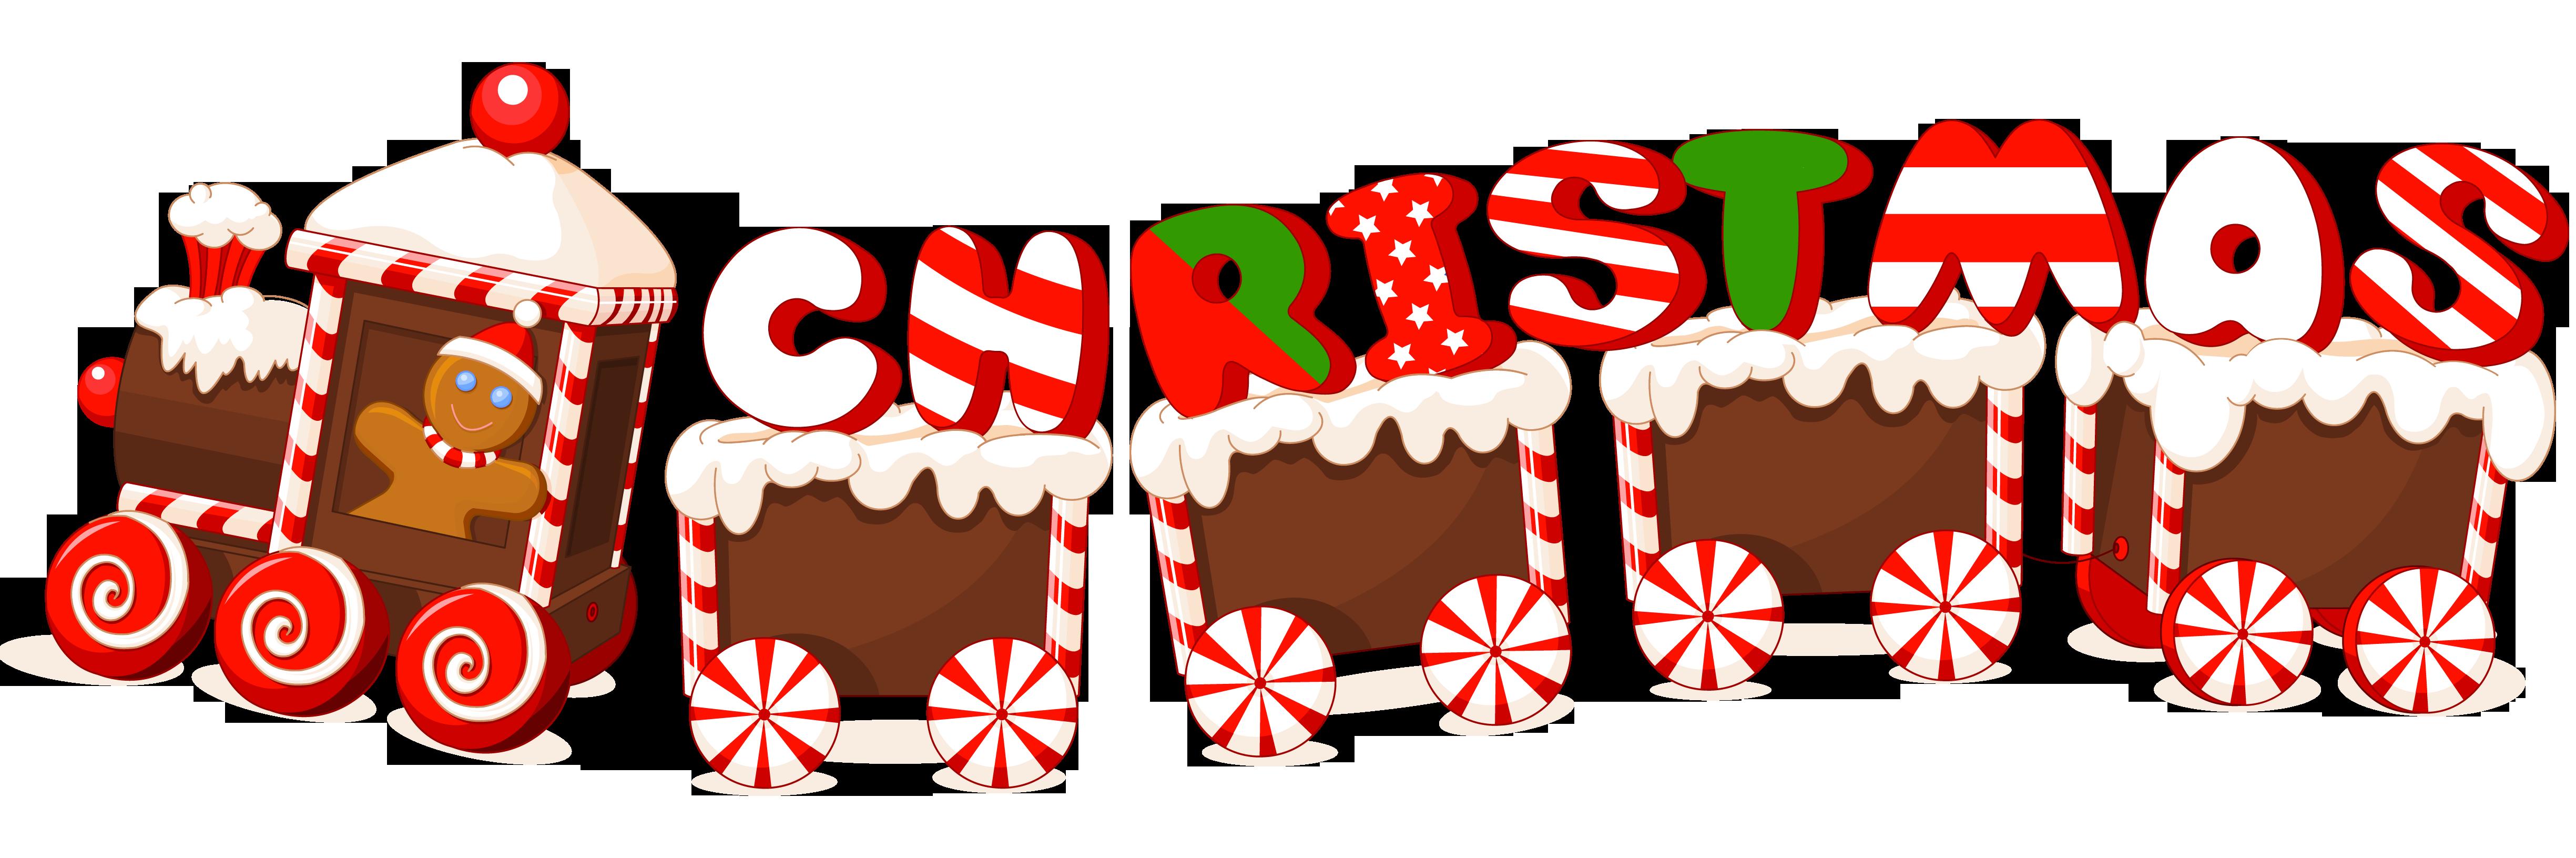 16 Merry Christmas Clipart-16 Merry Christmas Clipart-17